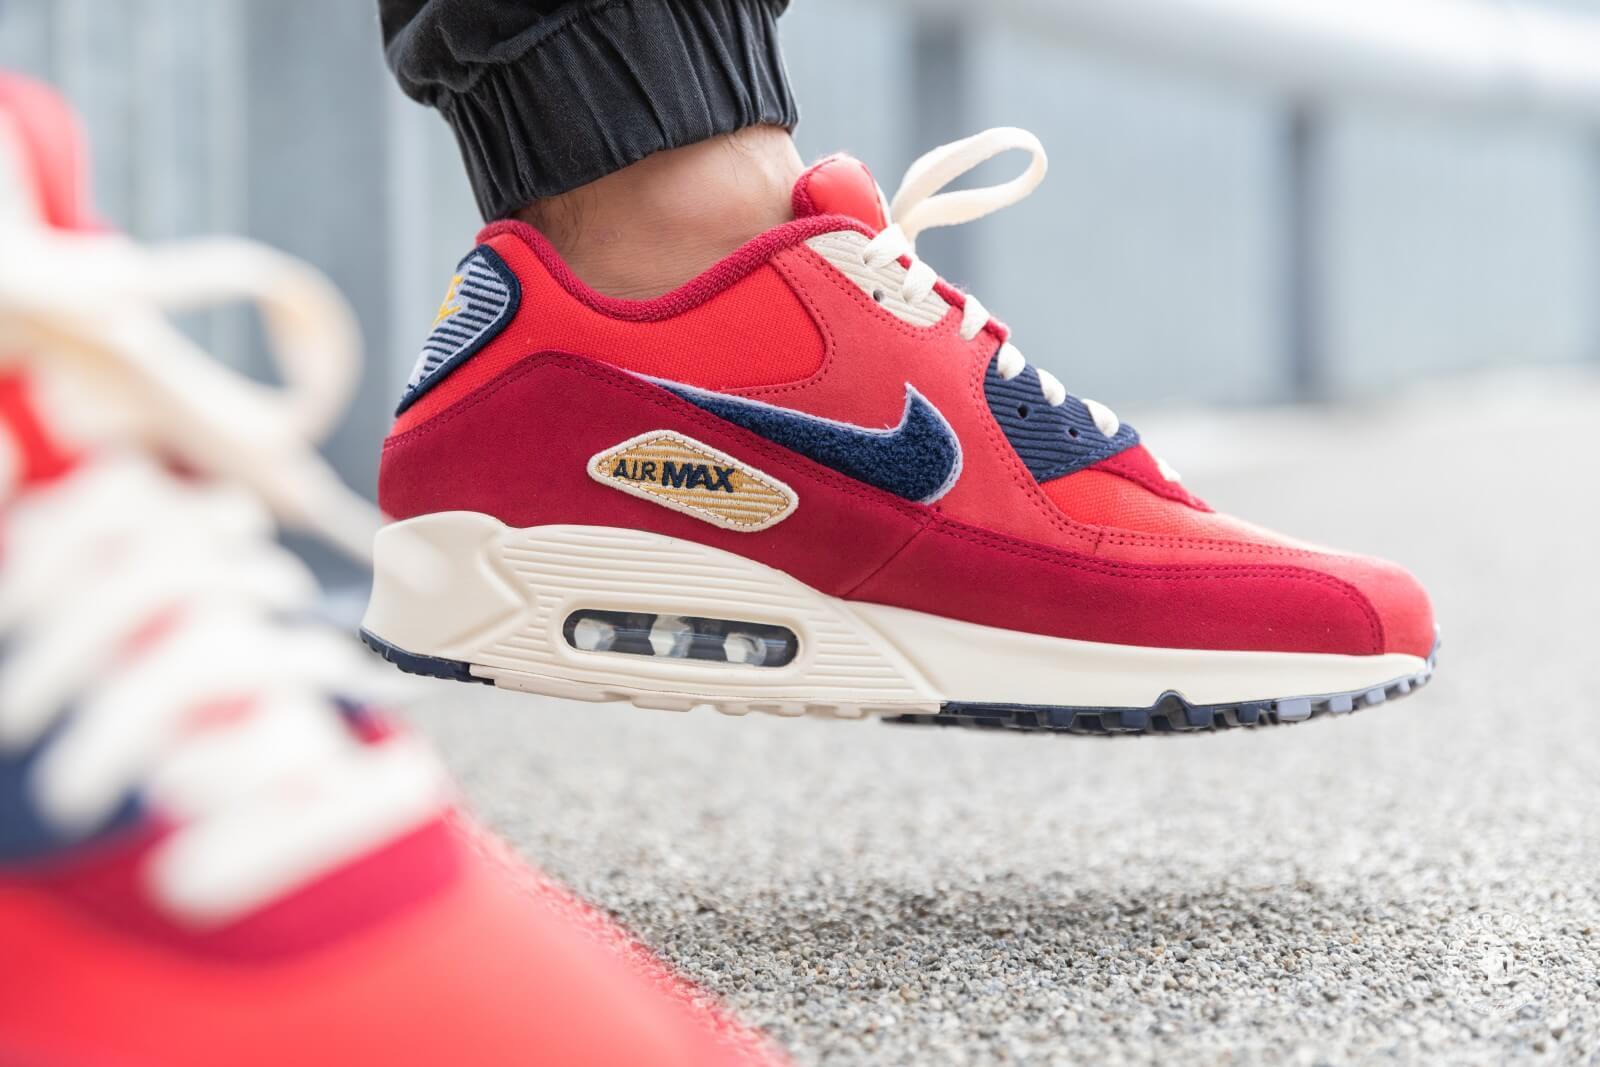 Nike Air Max 90 Essential RotWeiß Schuhe 537384 610